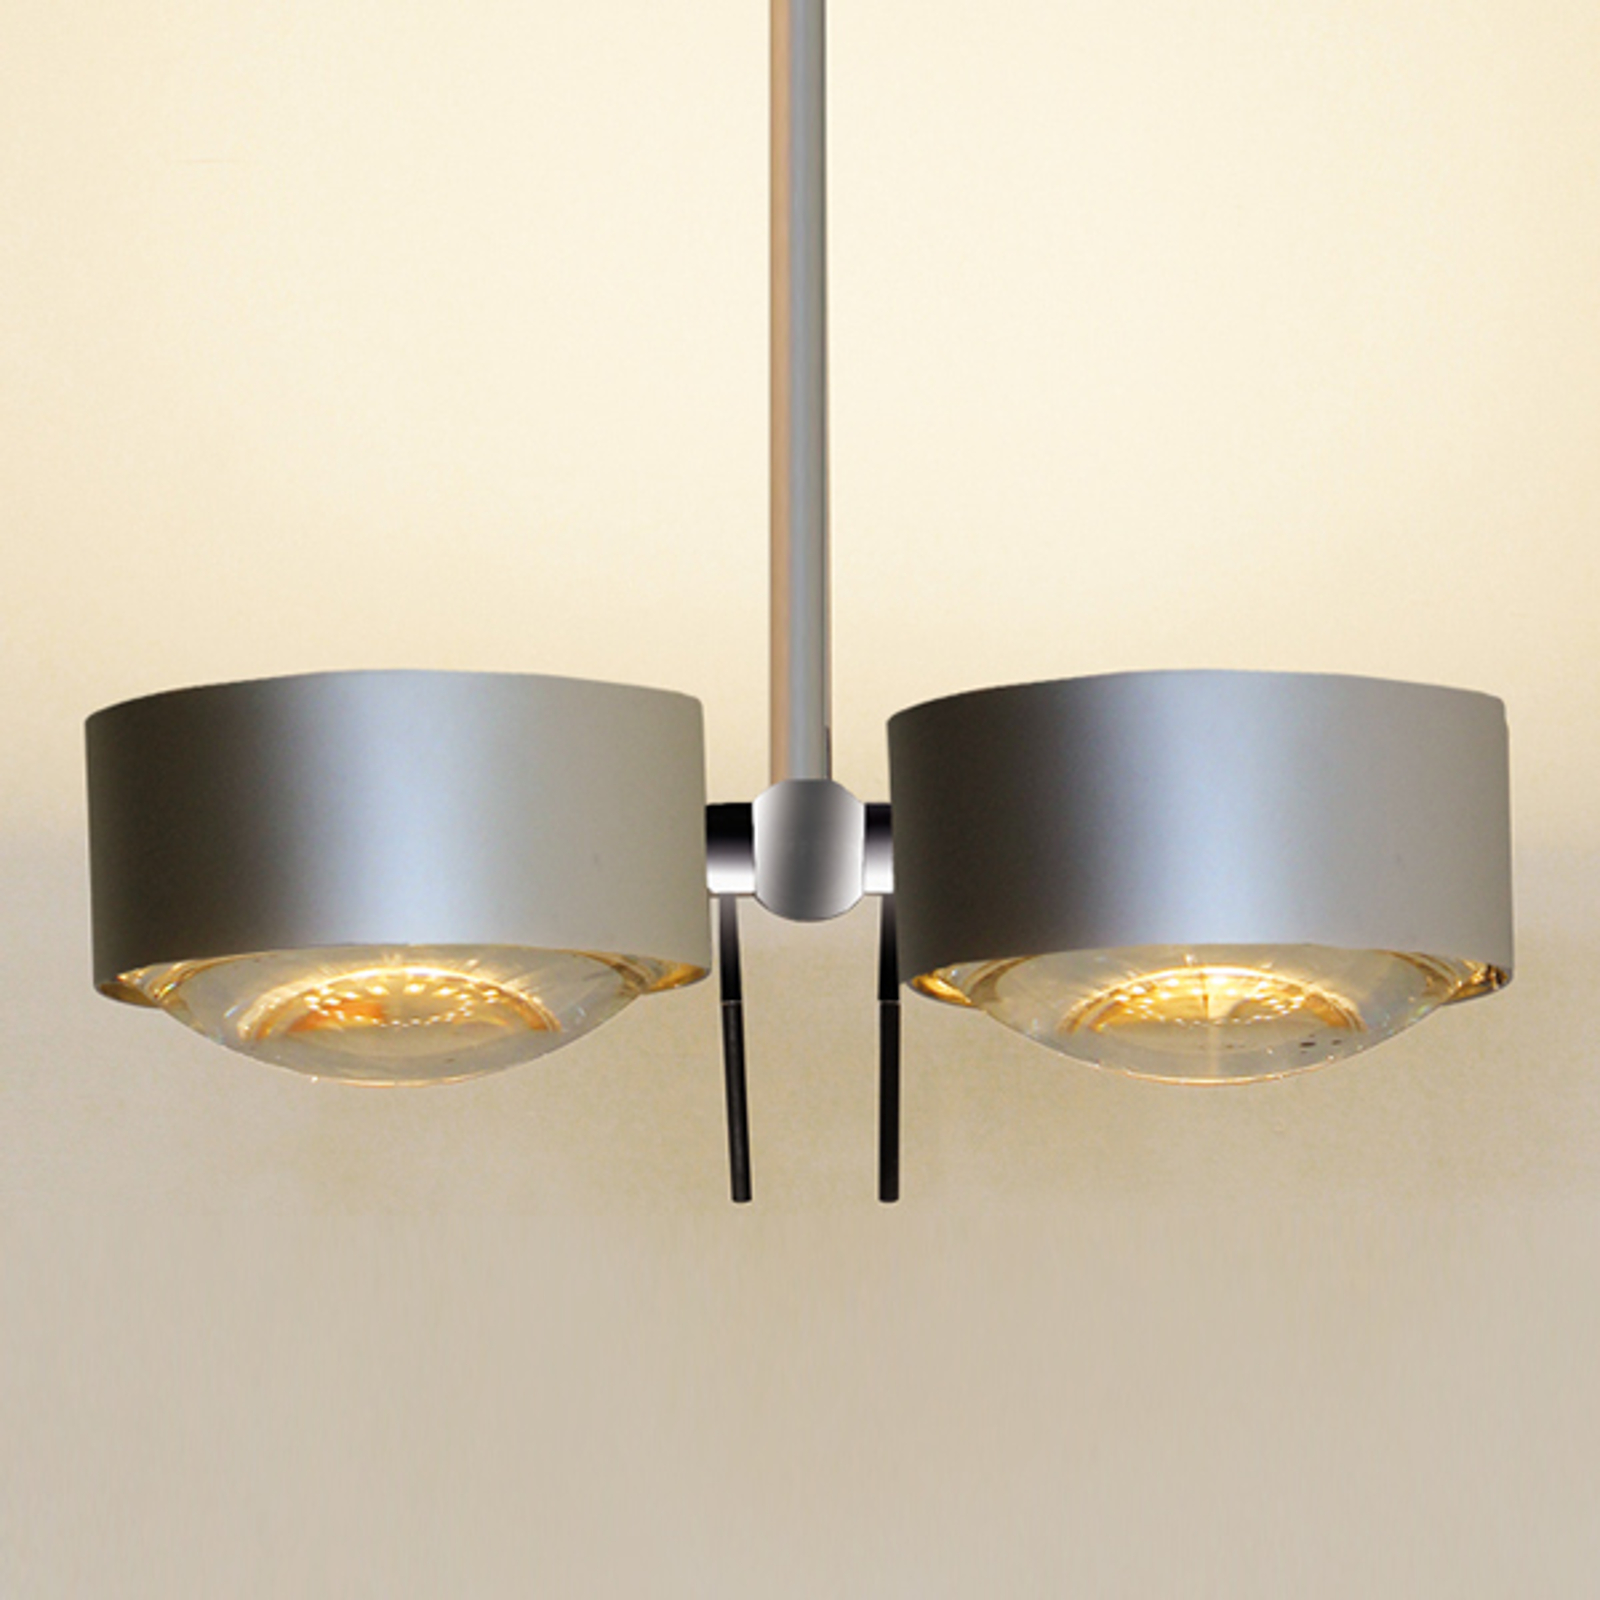 2-pkt. lampa sufitowa PUK SIDES, chrom mat 30 cm